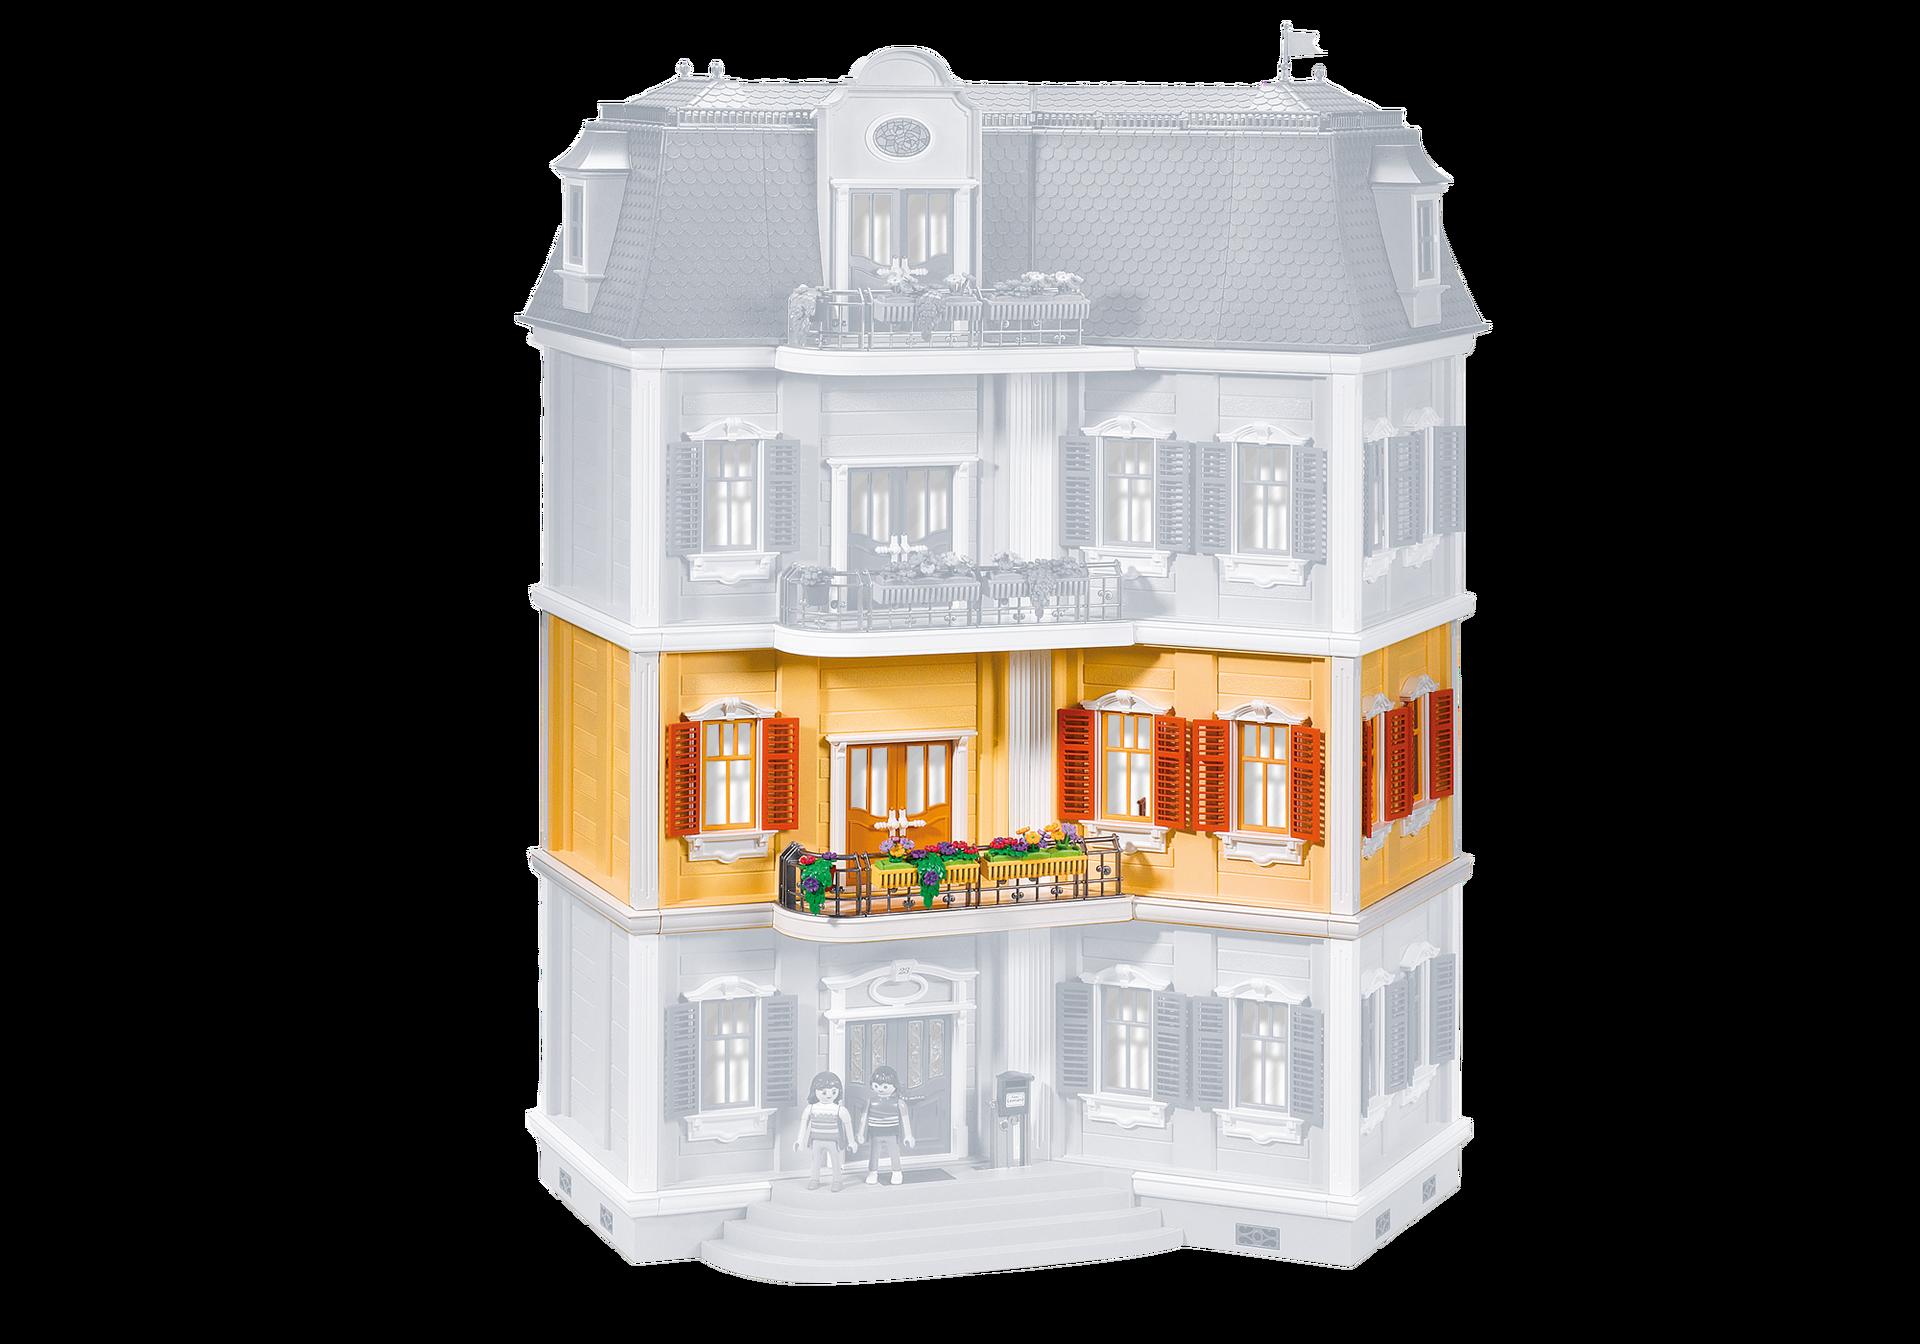 Extensi n para la gran casa de mu ecas 5302 7483 playmobil espa a - Gran casa de munecas playmobil ...